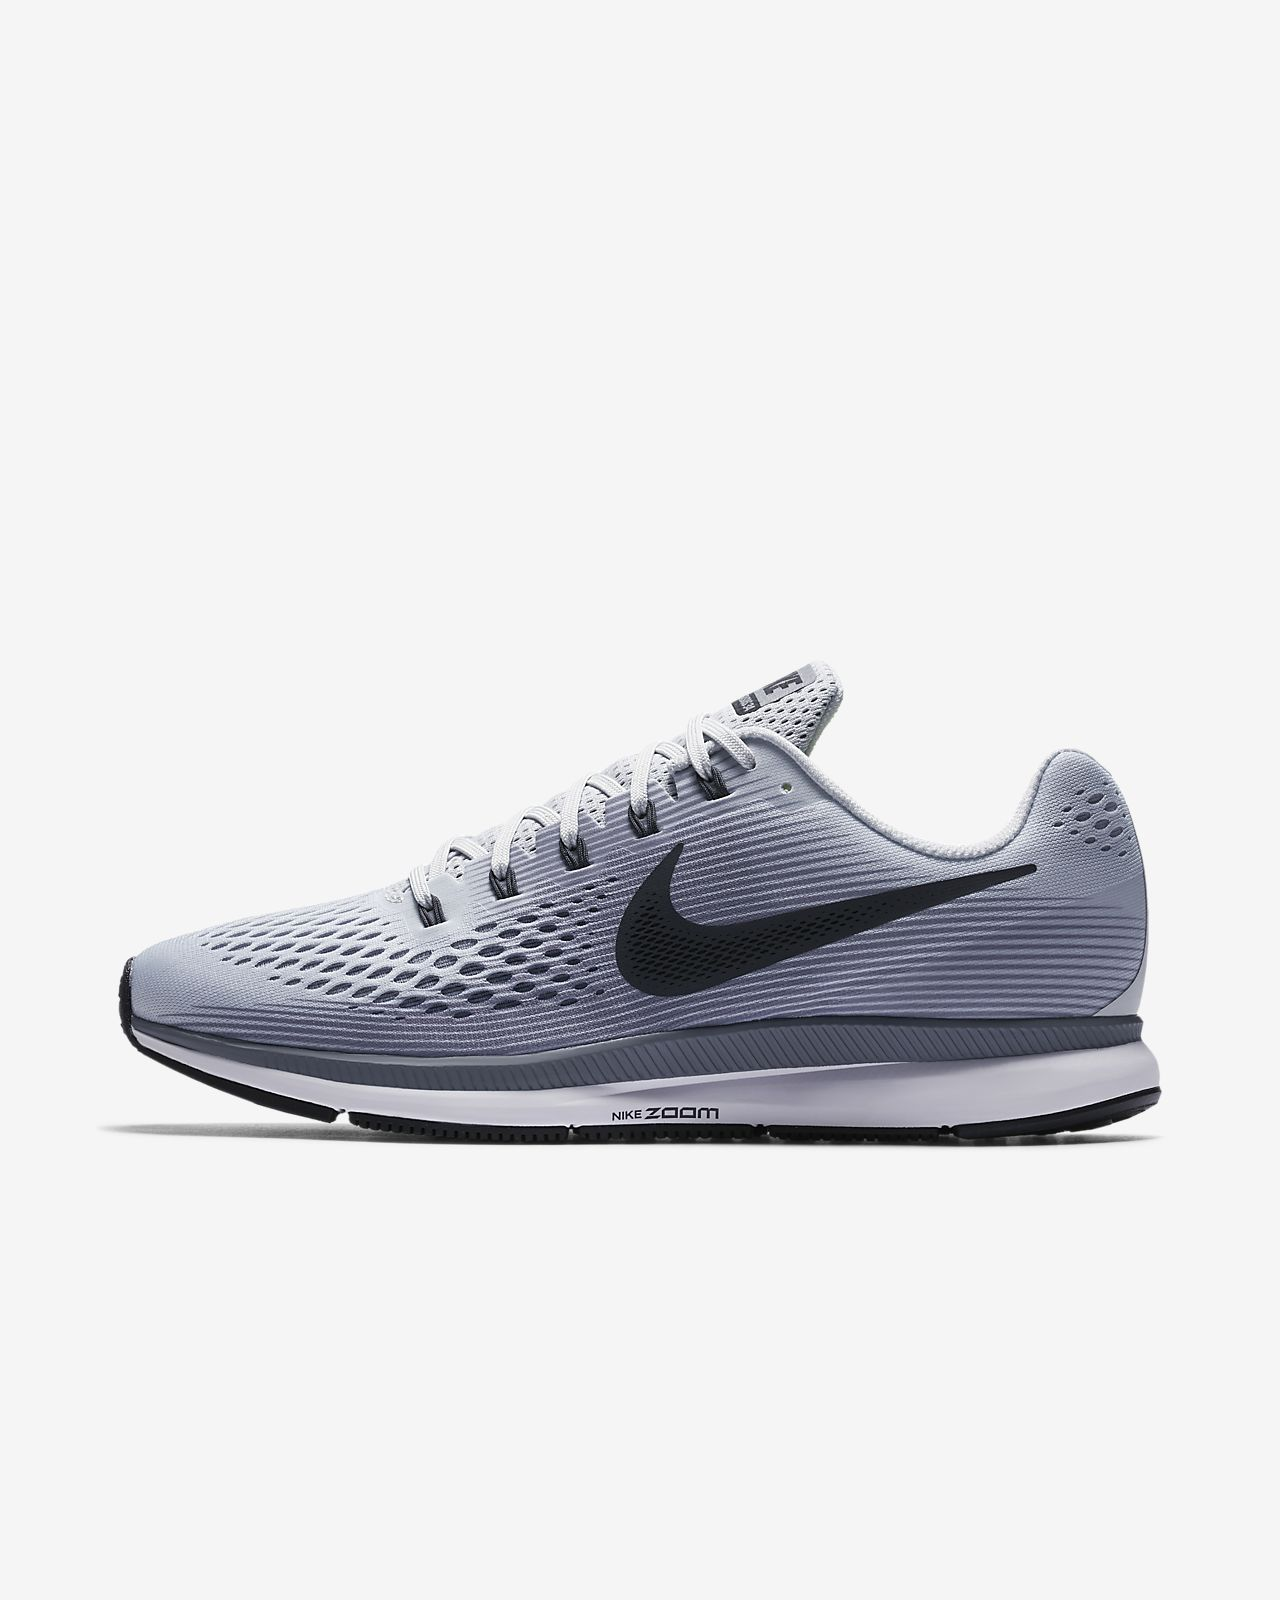 Air Pegasus Pour Nike Chaussure Ca De 34 Zoom Homme Running pWnpOx0P